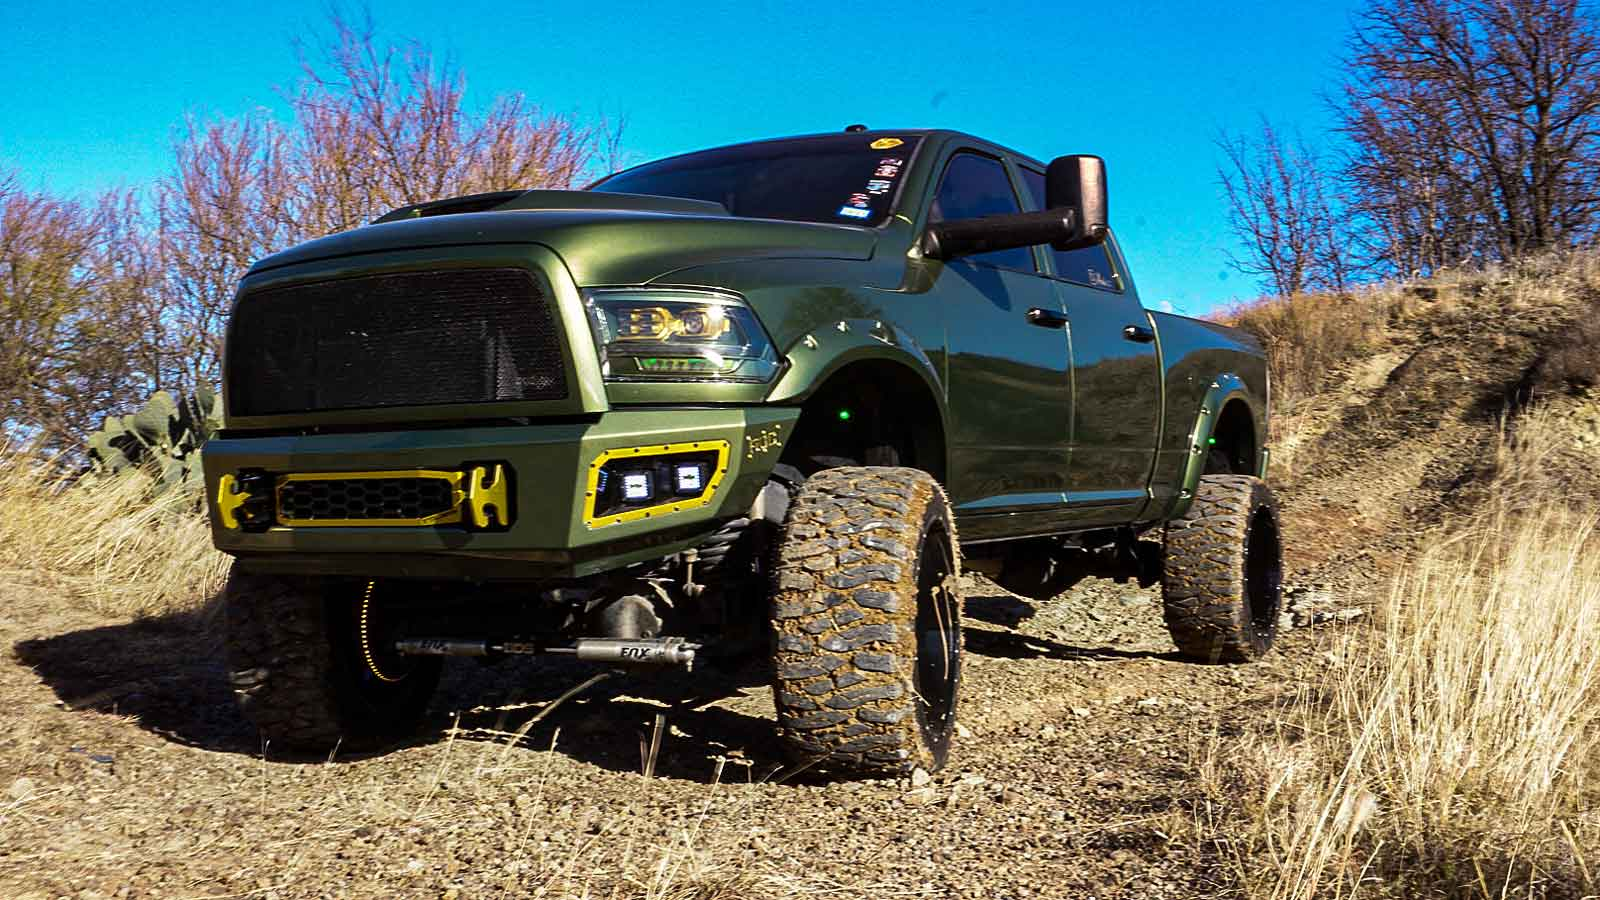 Green Dodge RAM 2500